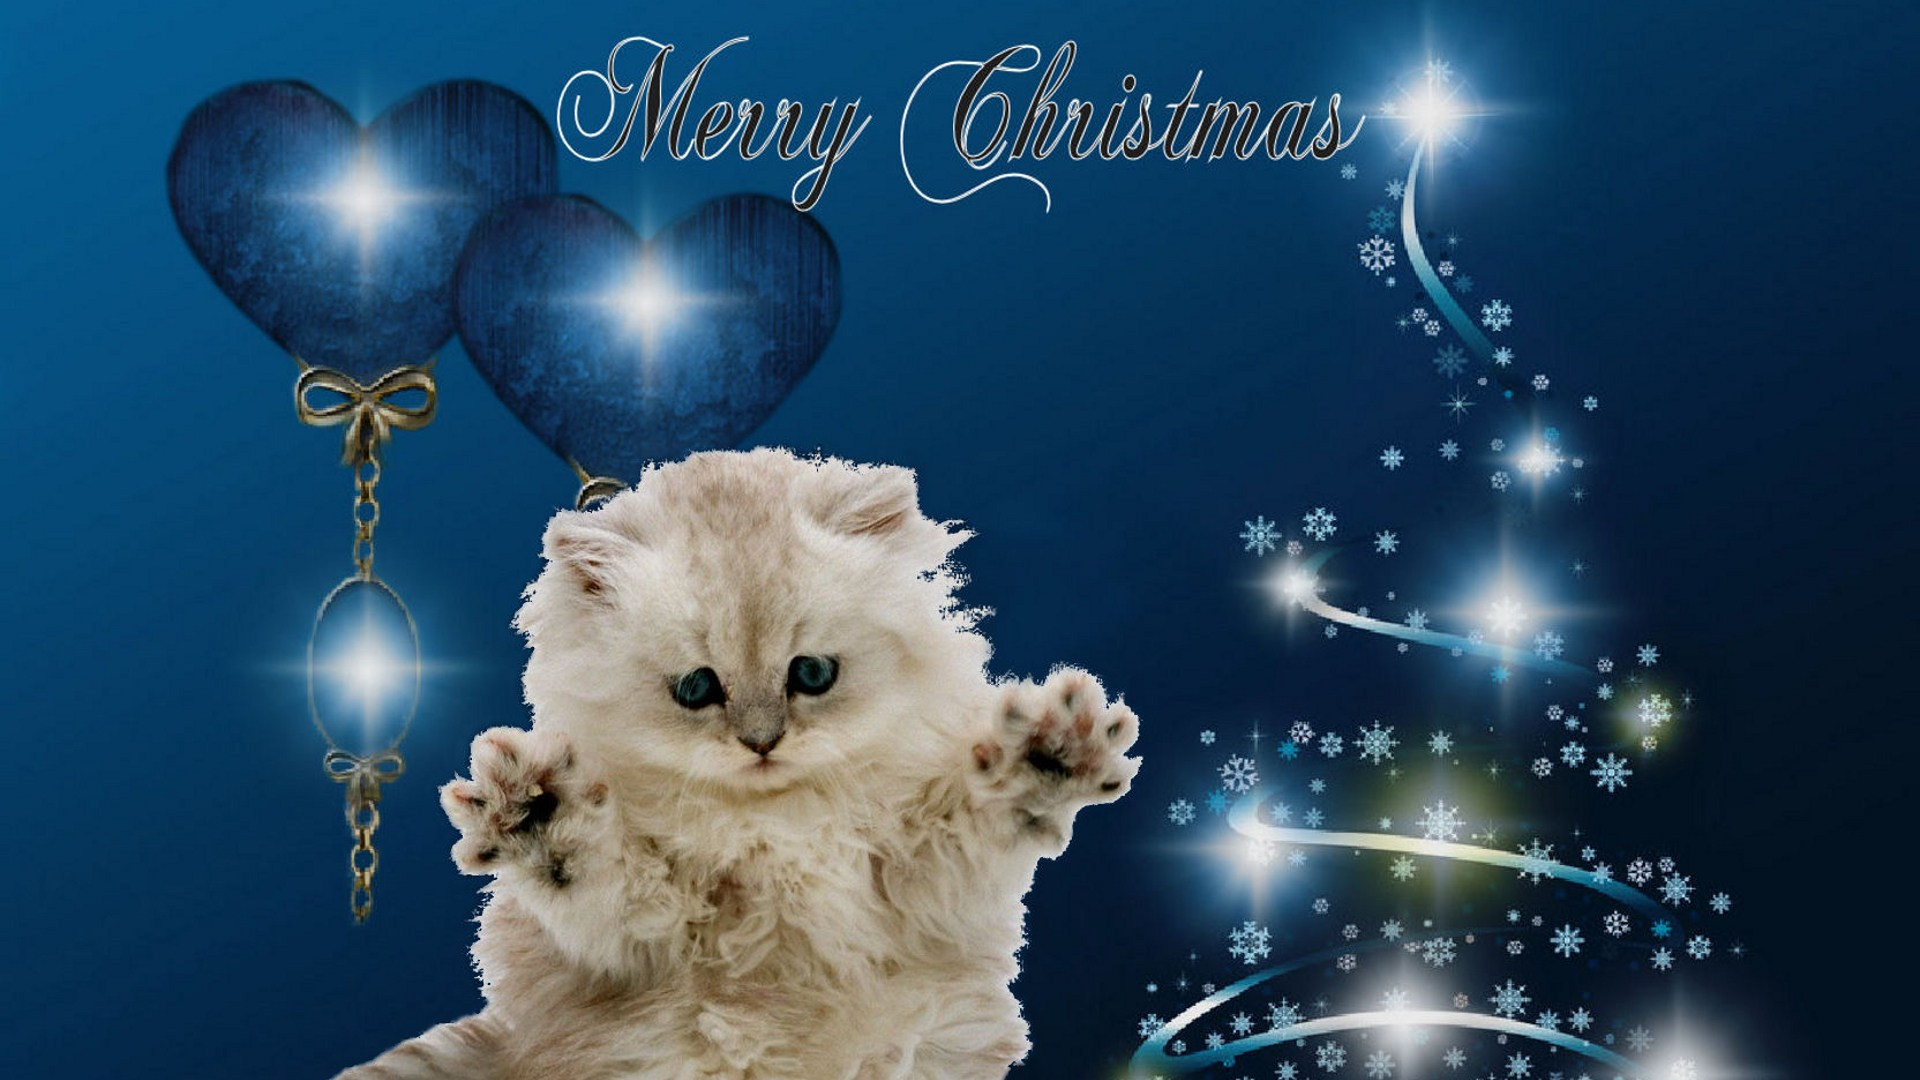 Télécharger Fonds D écran Noël Full Hd Gratuitement